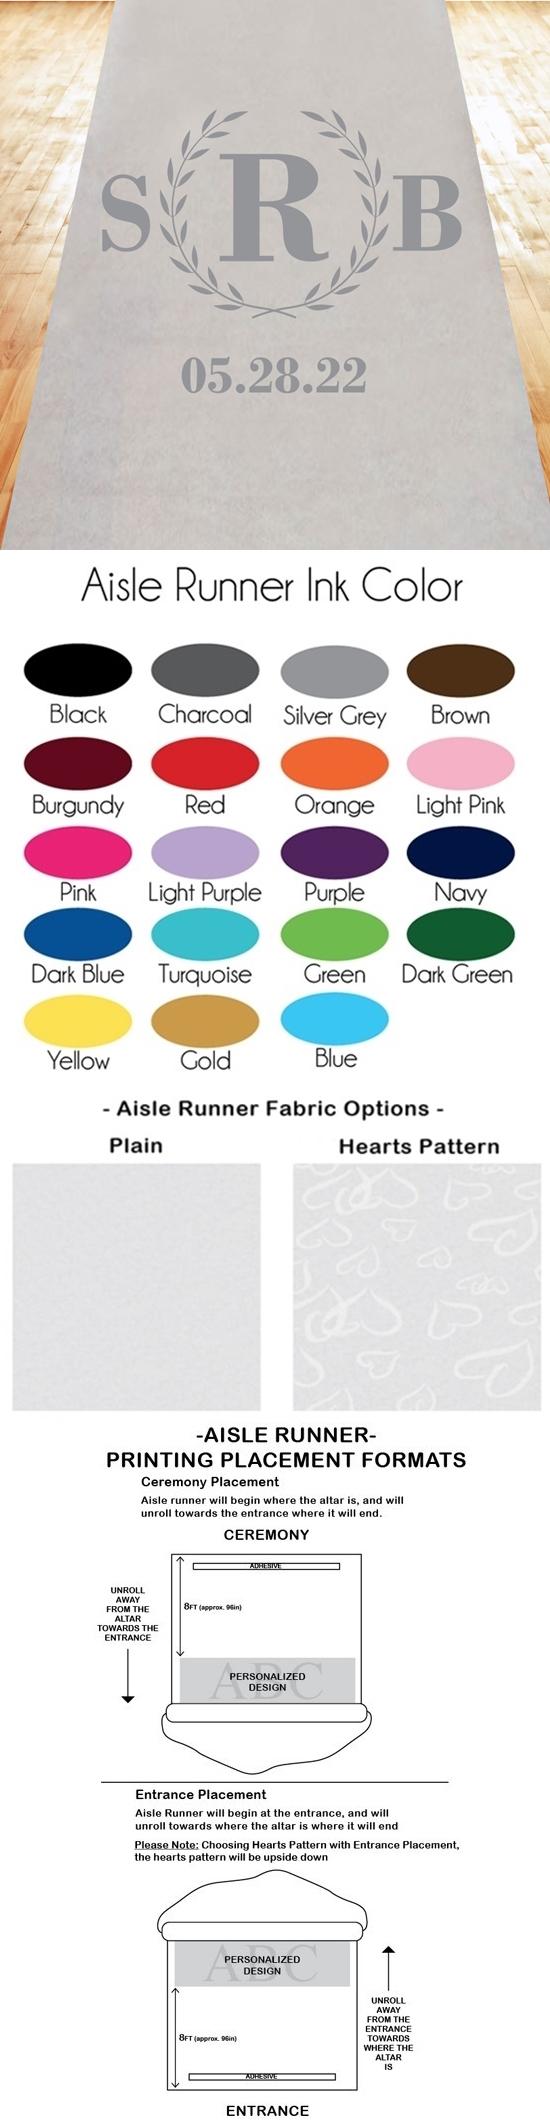 Classic Wreath Monogram Design Personalized Aisle Runner (19 Colors)